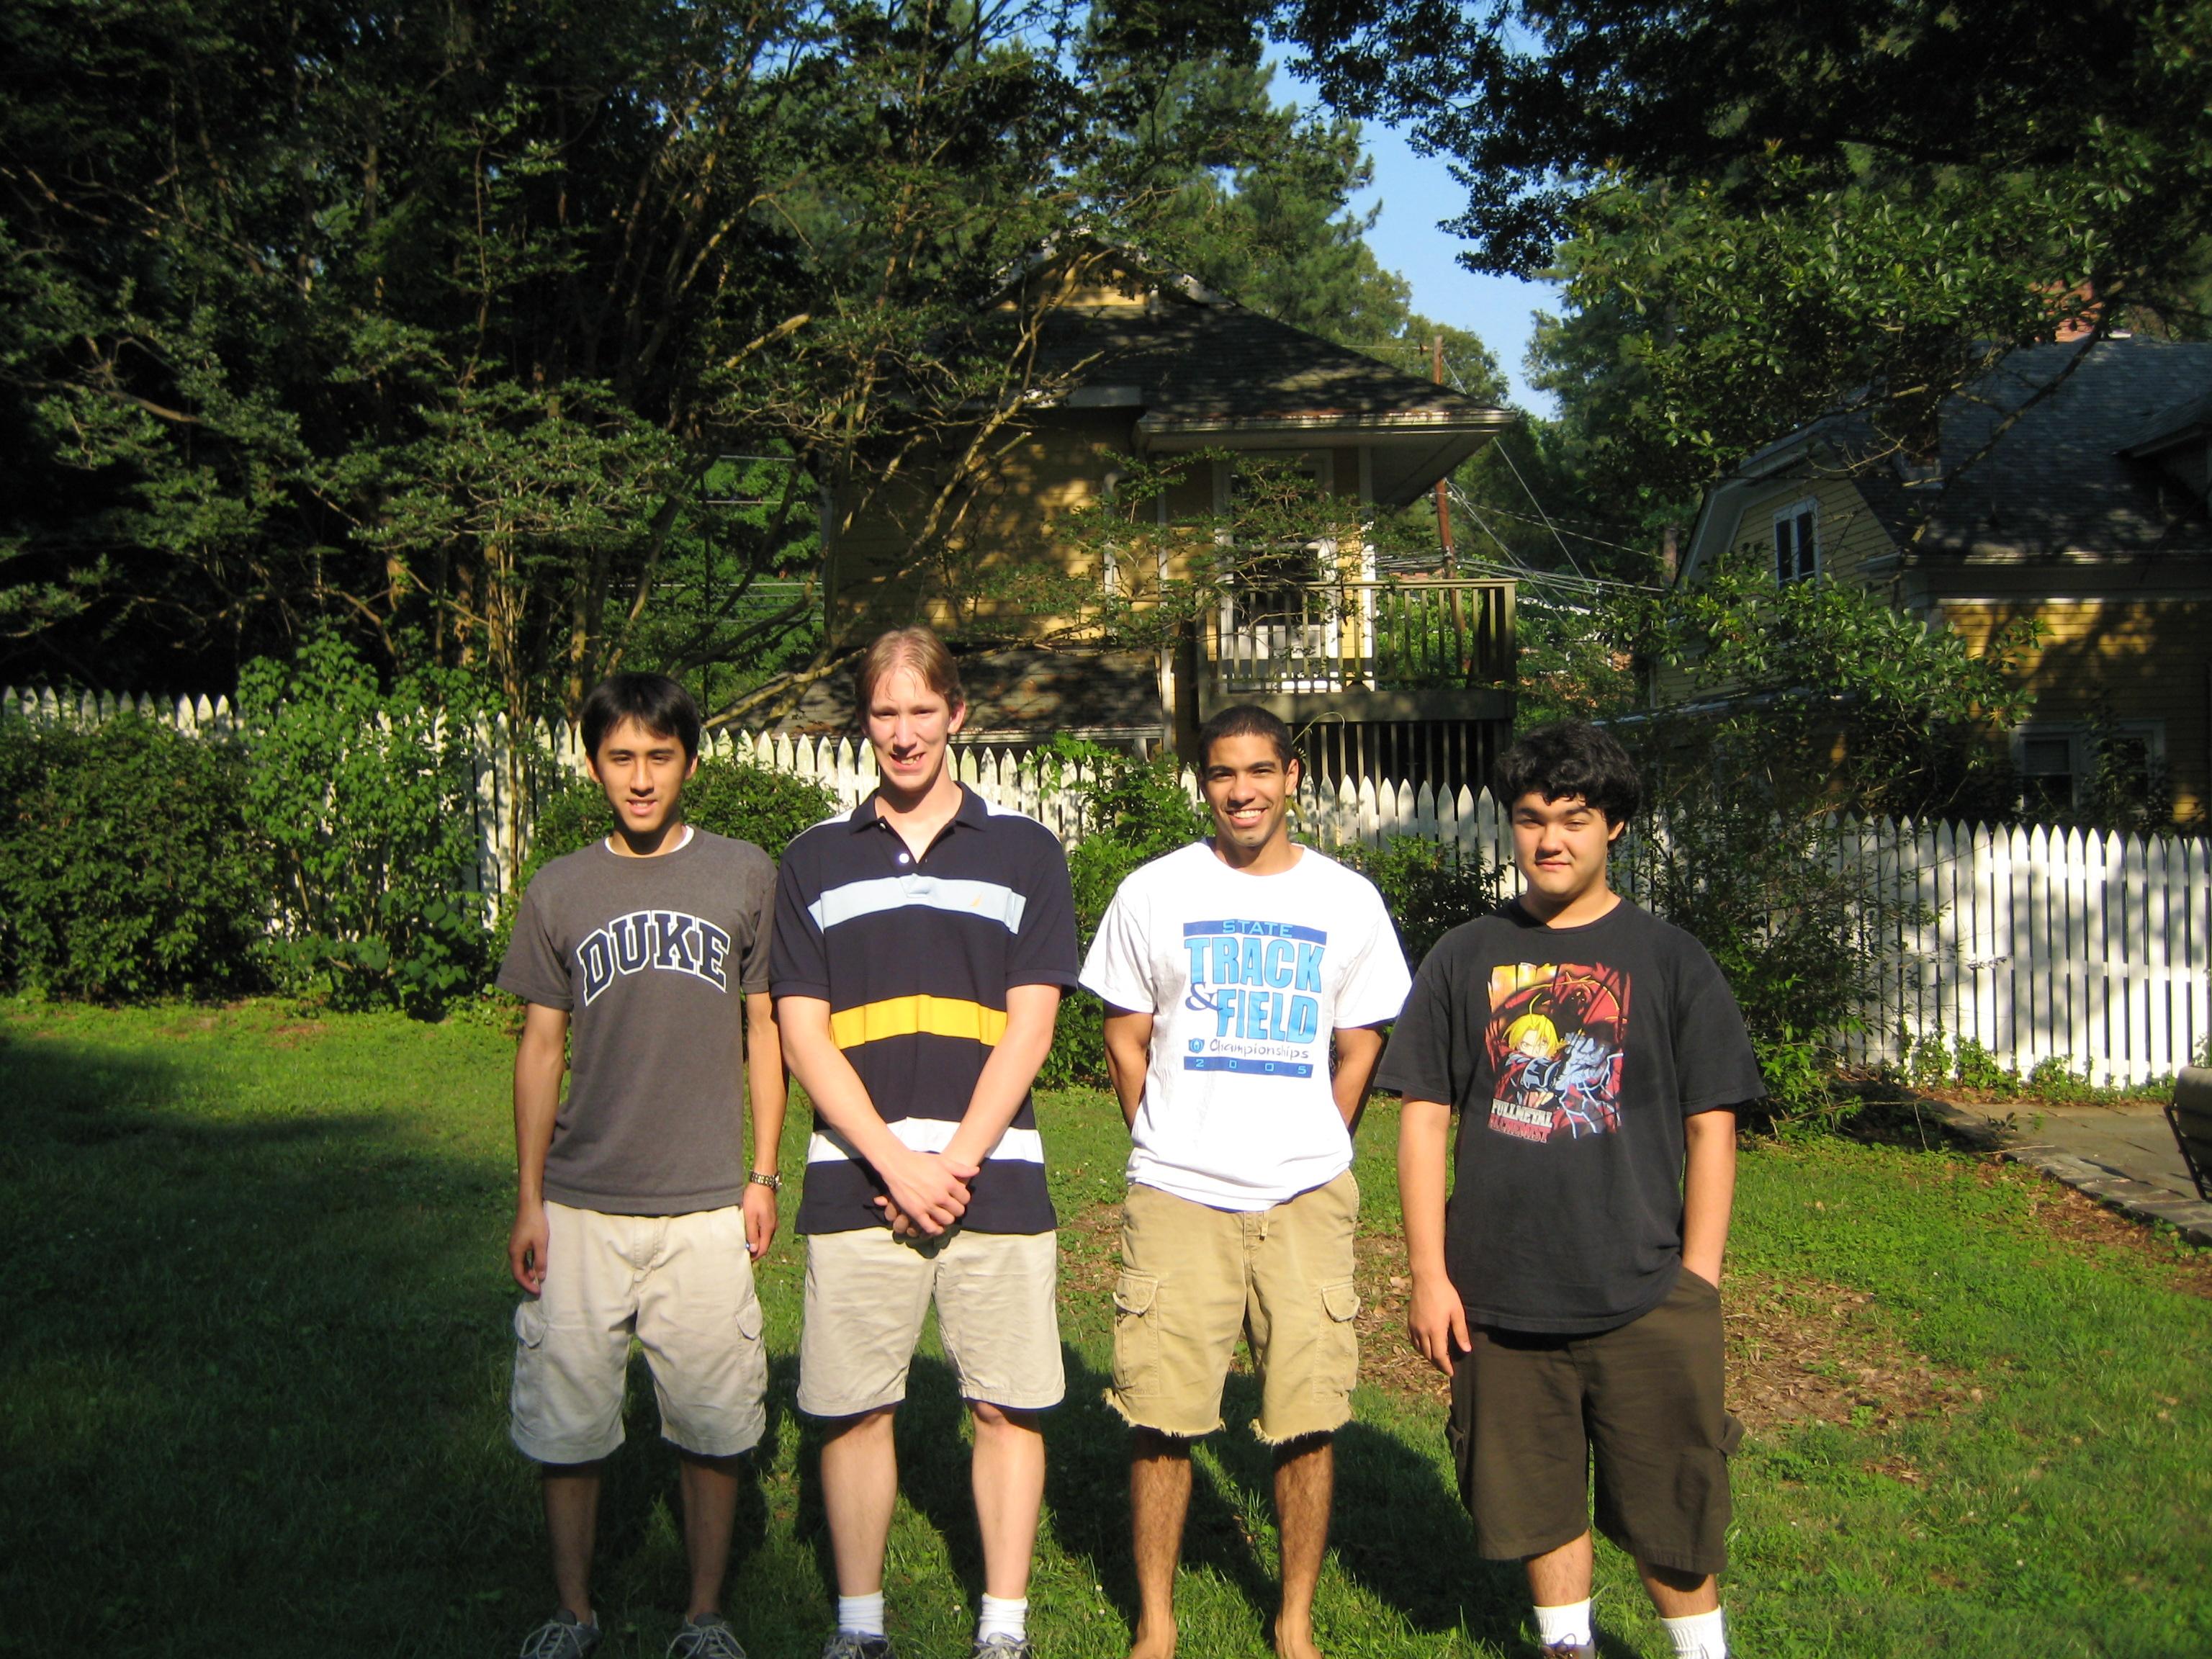 PRUV 2007 Math Research and PRUV Fellows